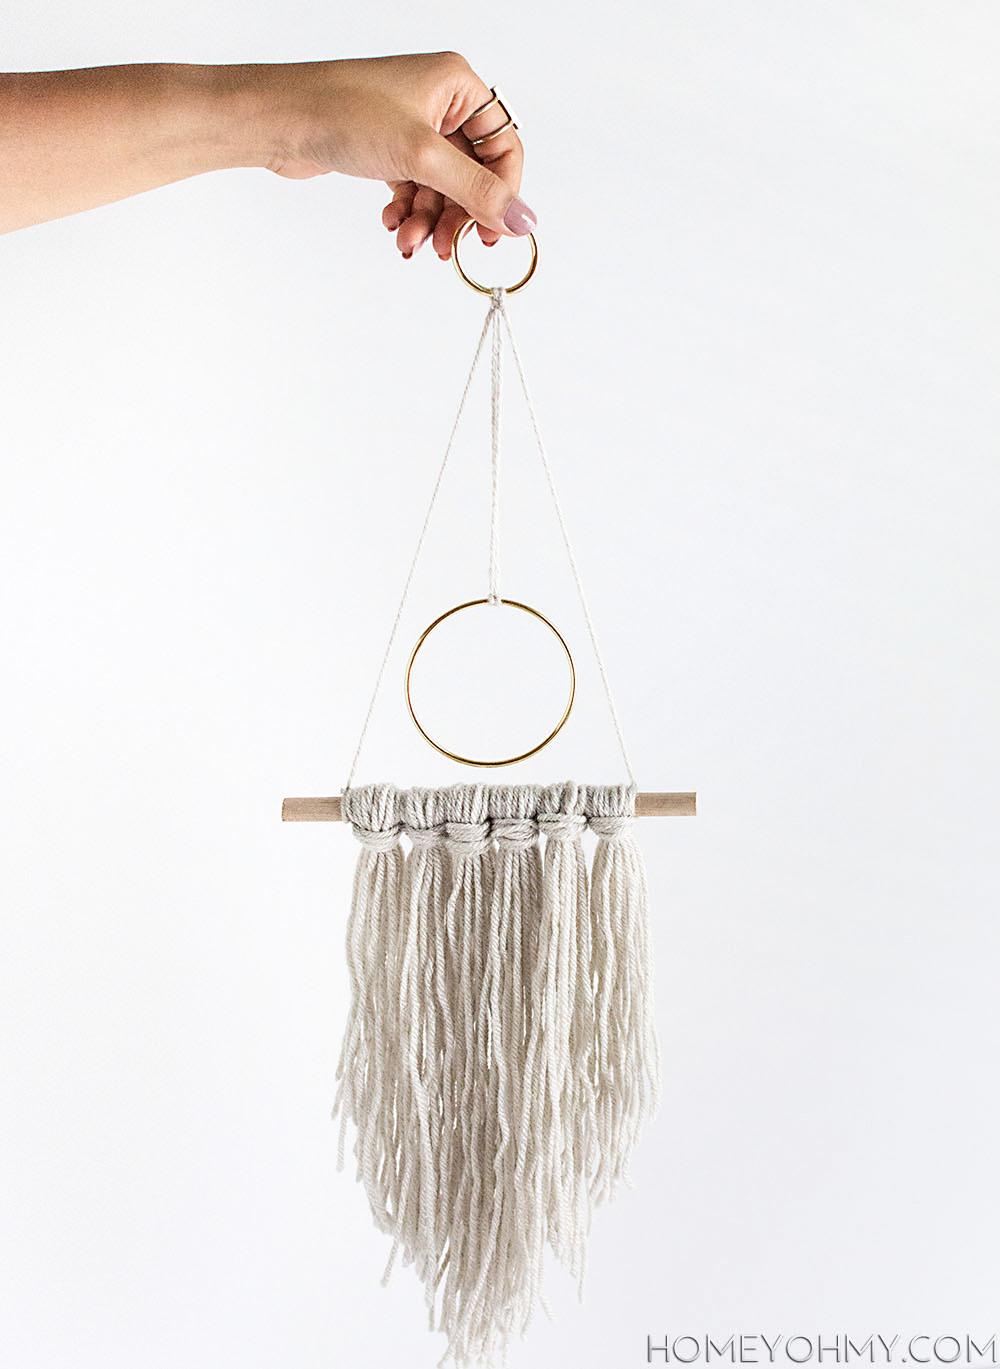 diy modern yarn hanging homey oh my pinterest